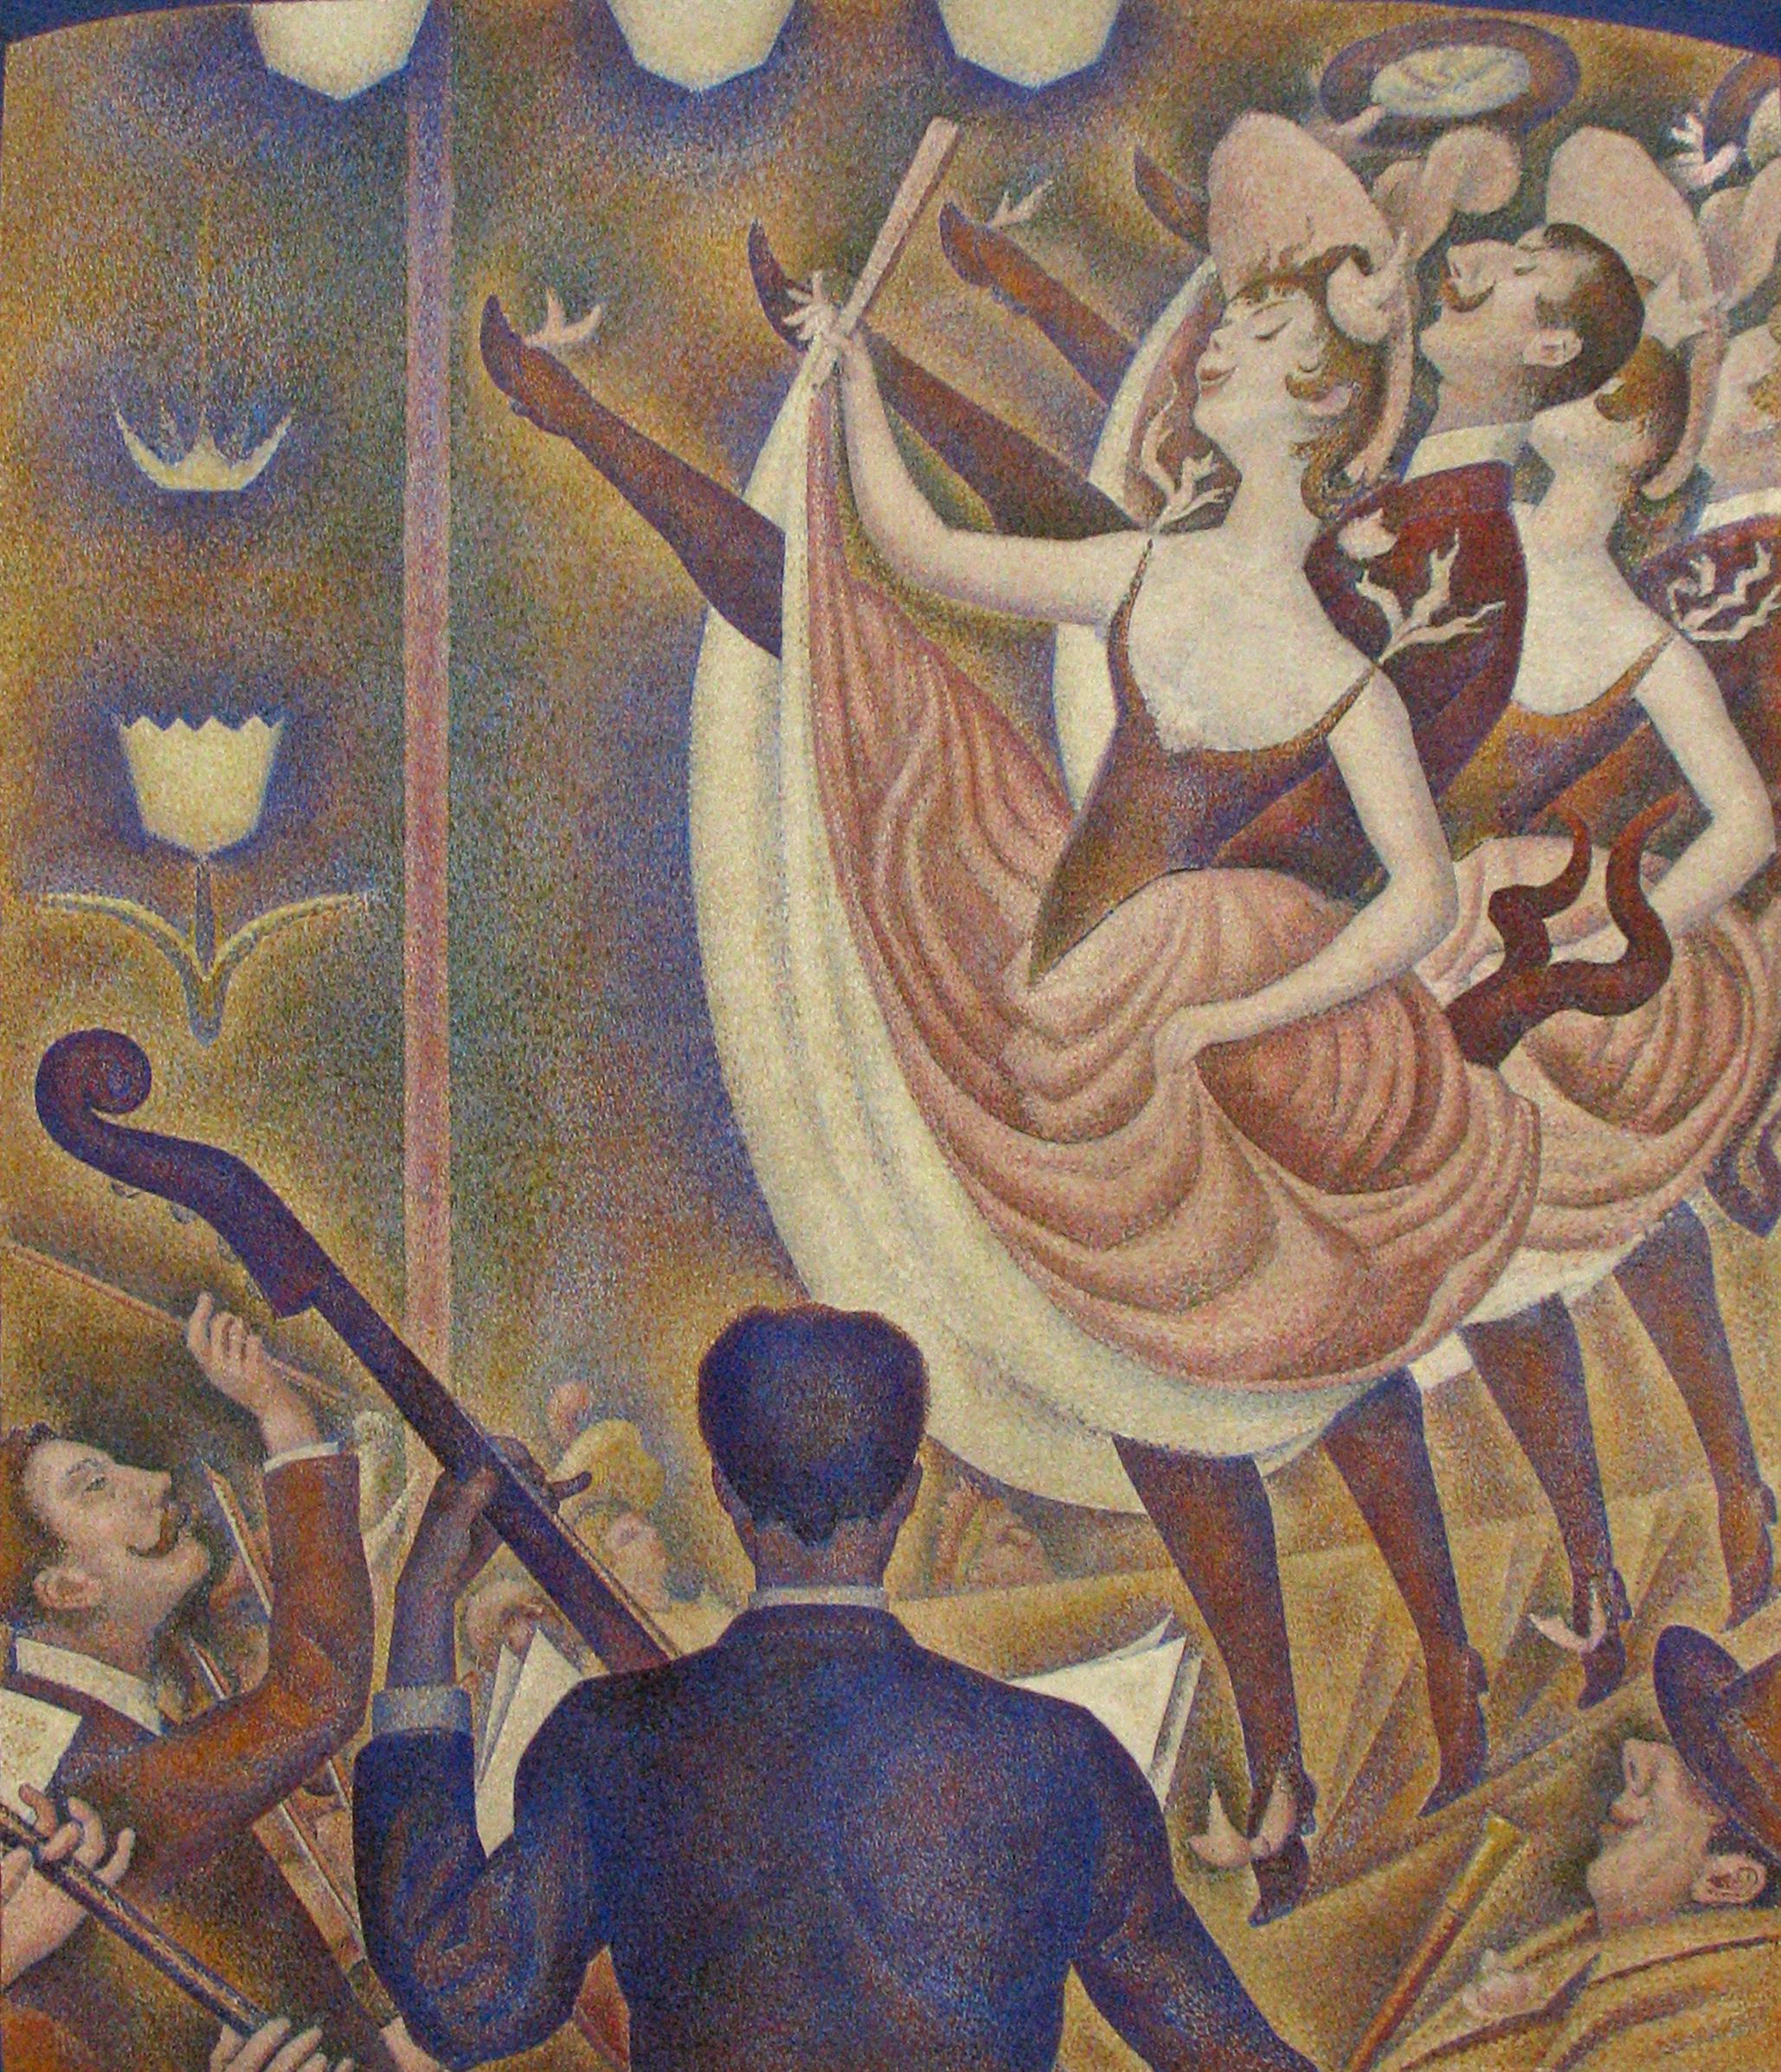 Figura 5. Georges Seurat, Le Chahut